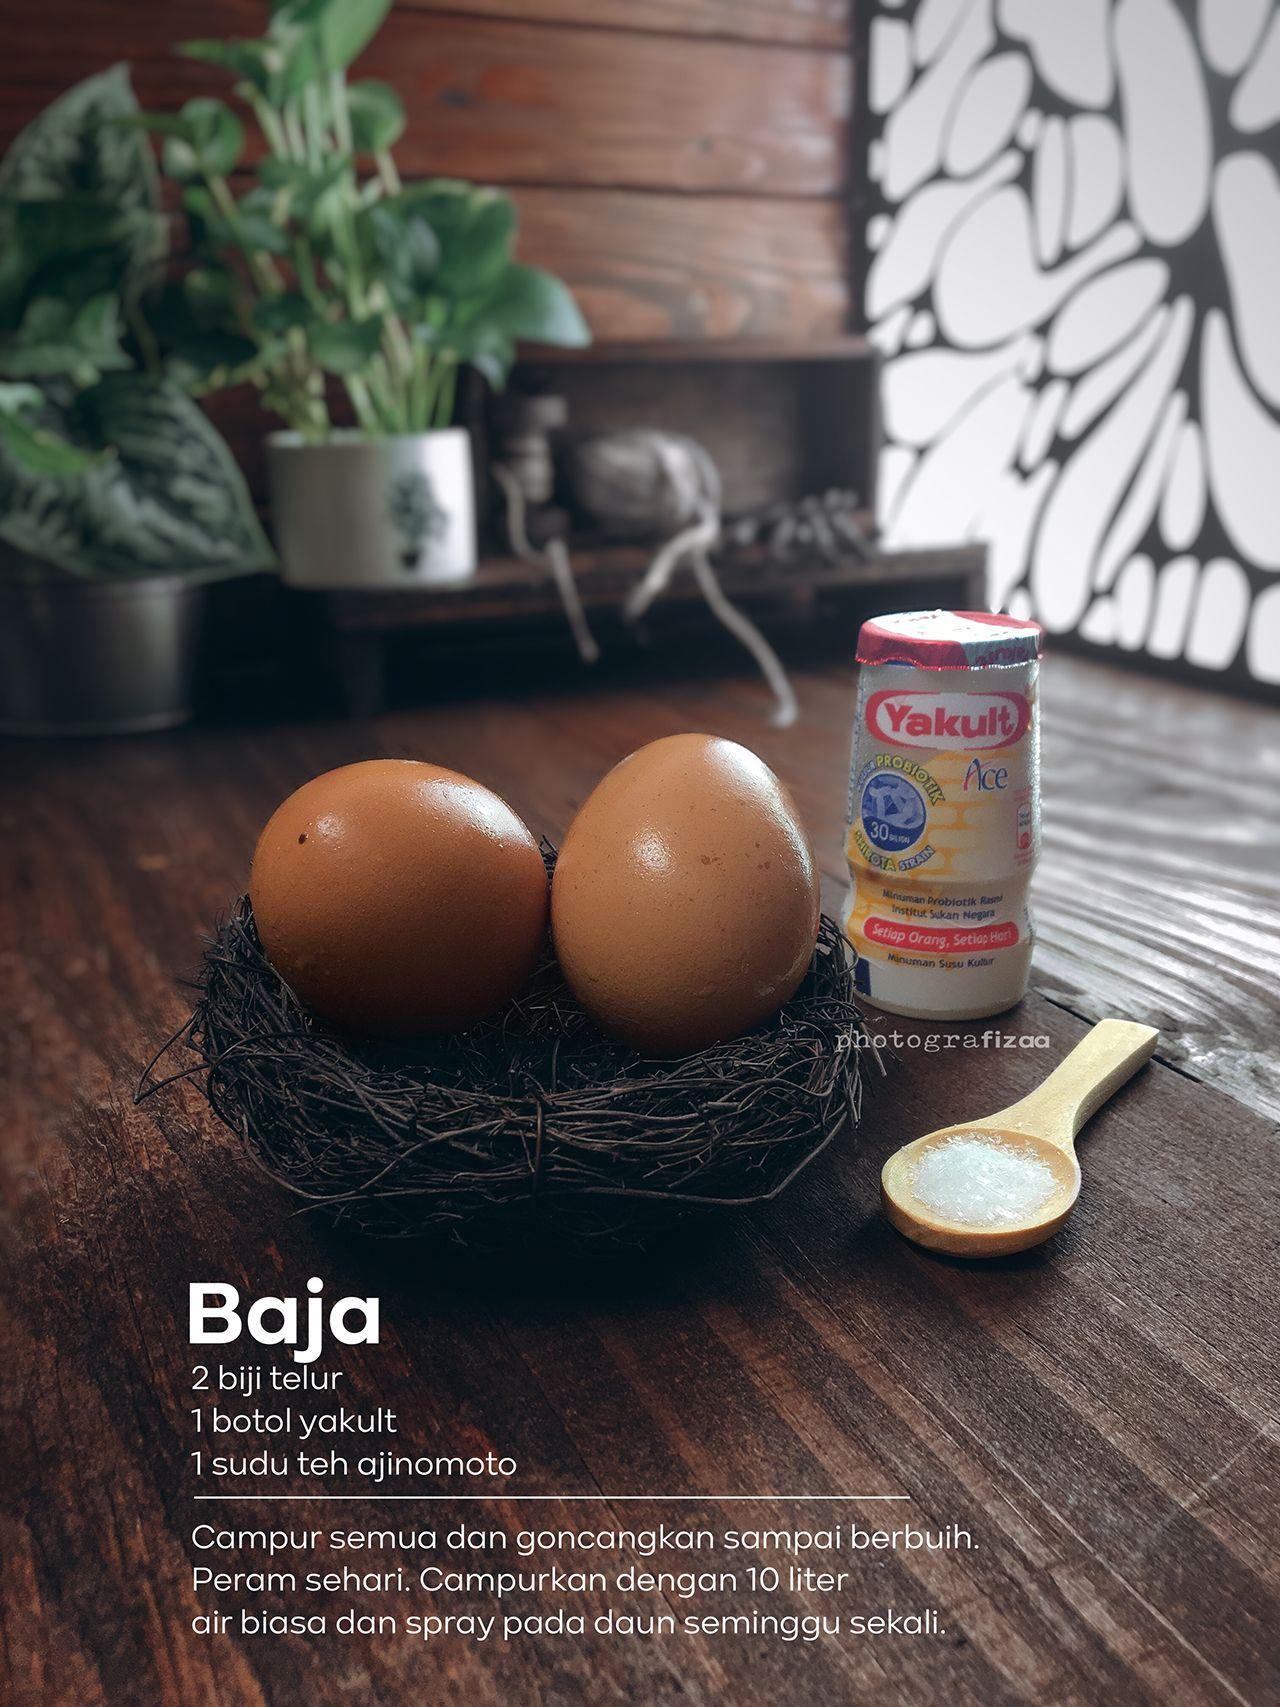 Percubaan Buat Dan Guna Baja Yakult Telur Dan Ajinomoto Telur Resep Sehat Resep